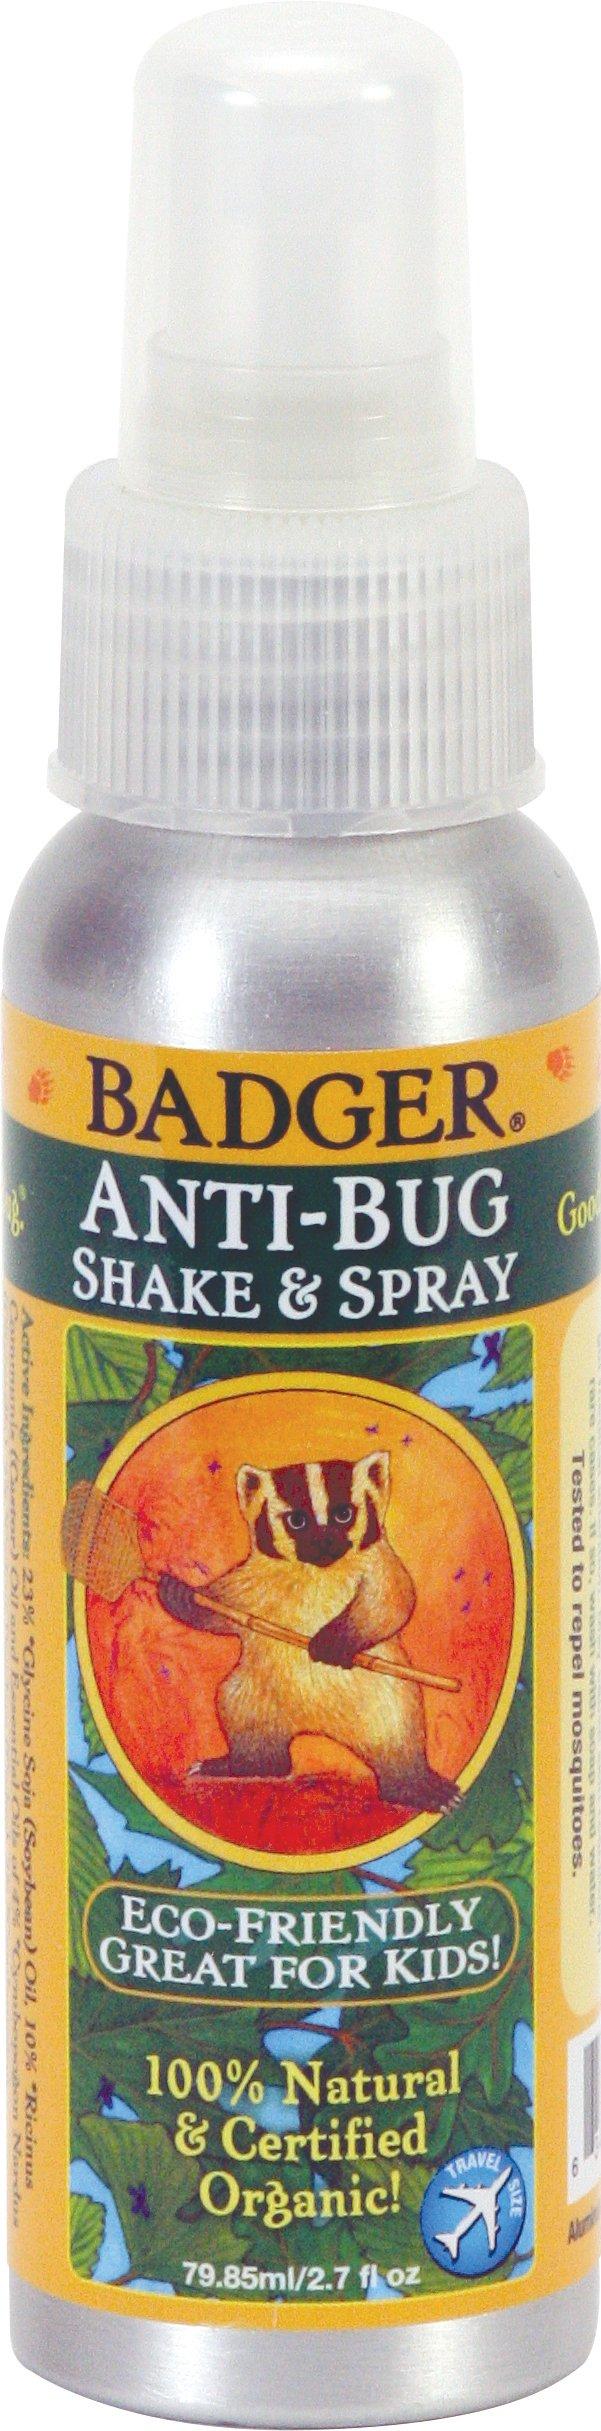 Badger Anti Bug Balmcitronella Rosemary 2 Oz Grocery Beauty Barn Kid Citronella Body Oil Shake Spray 27 Fl